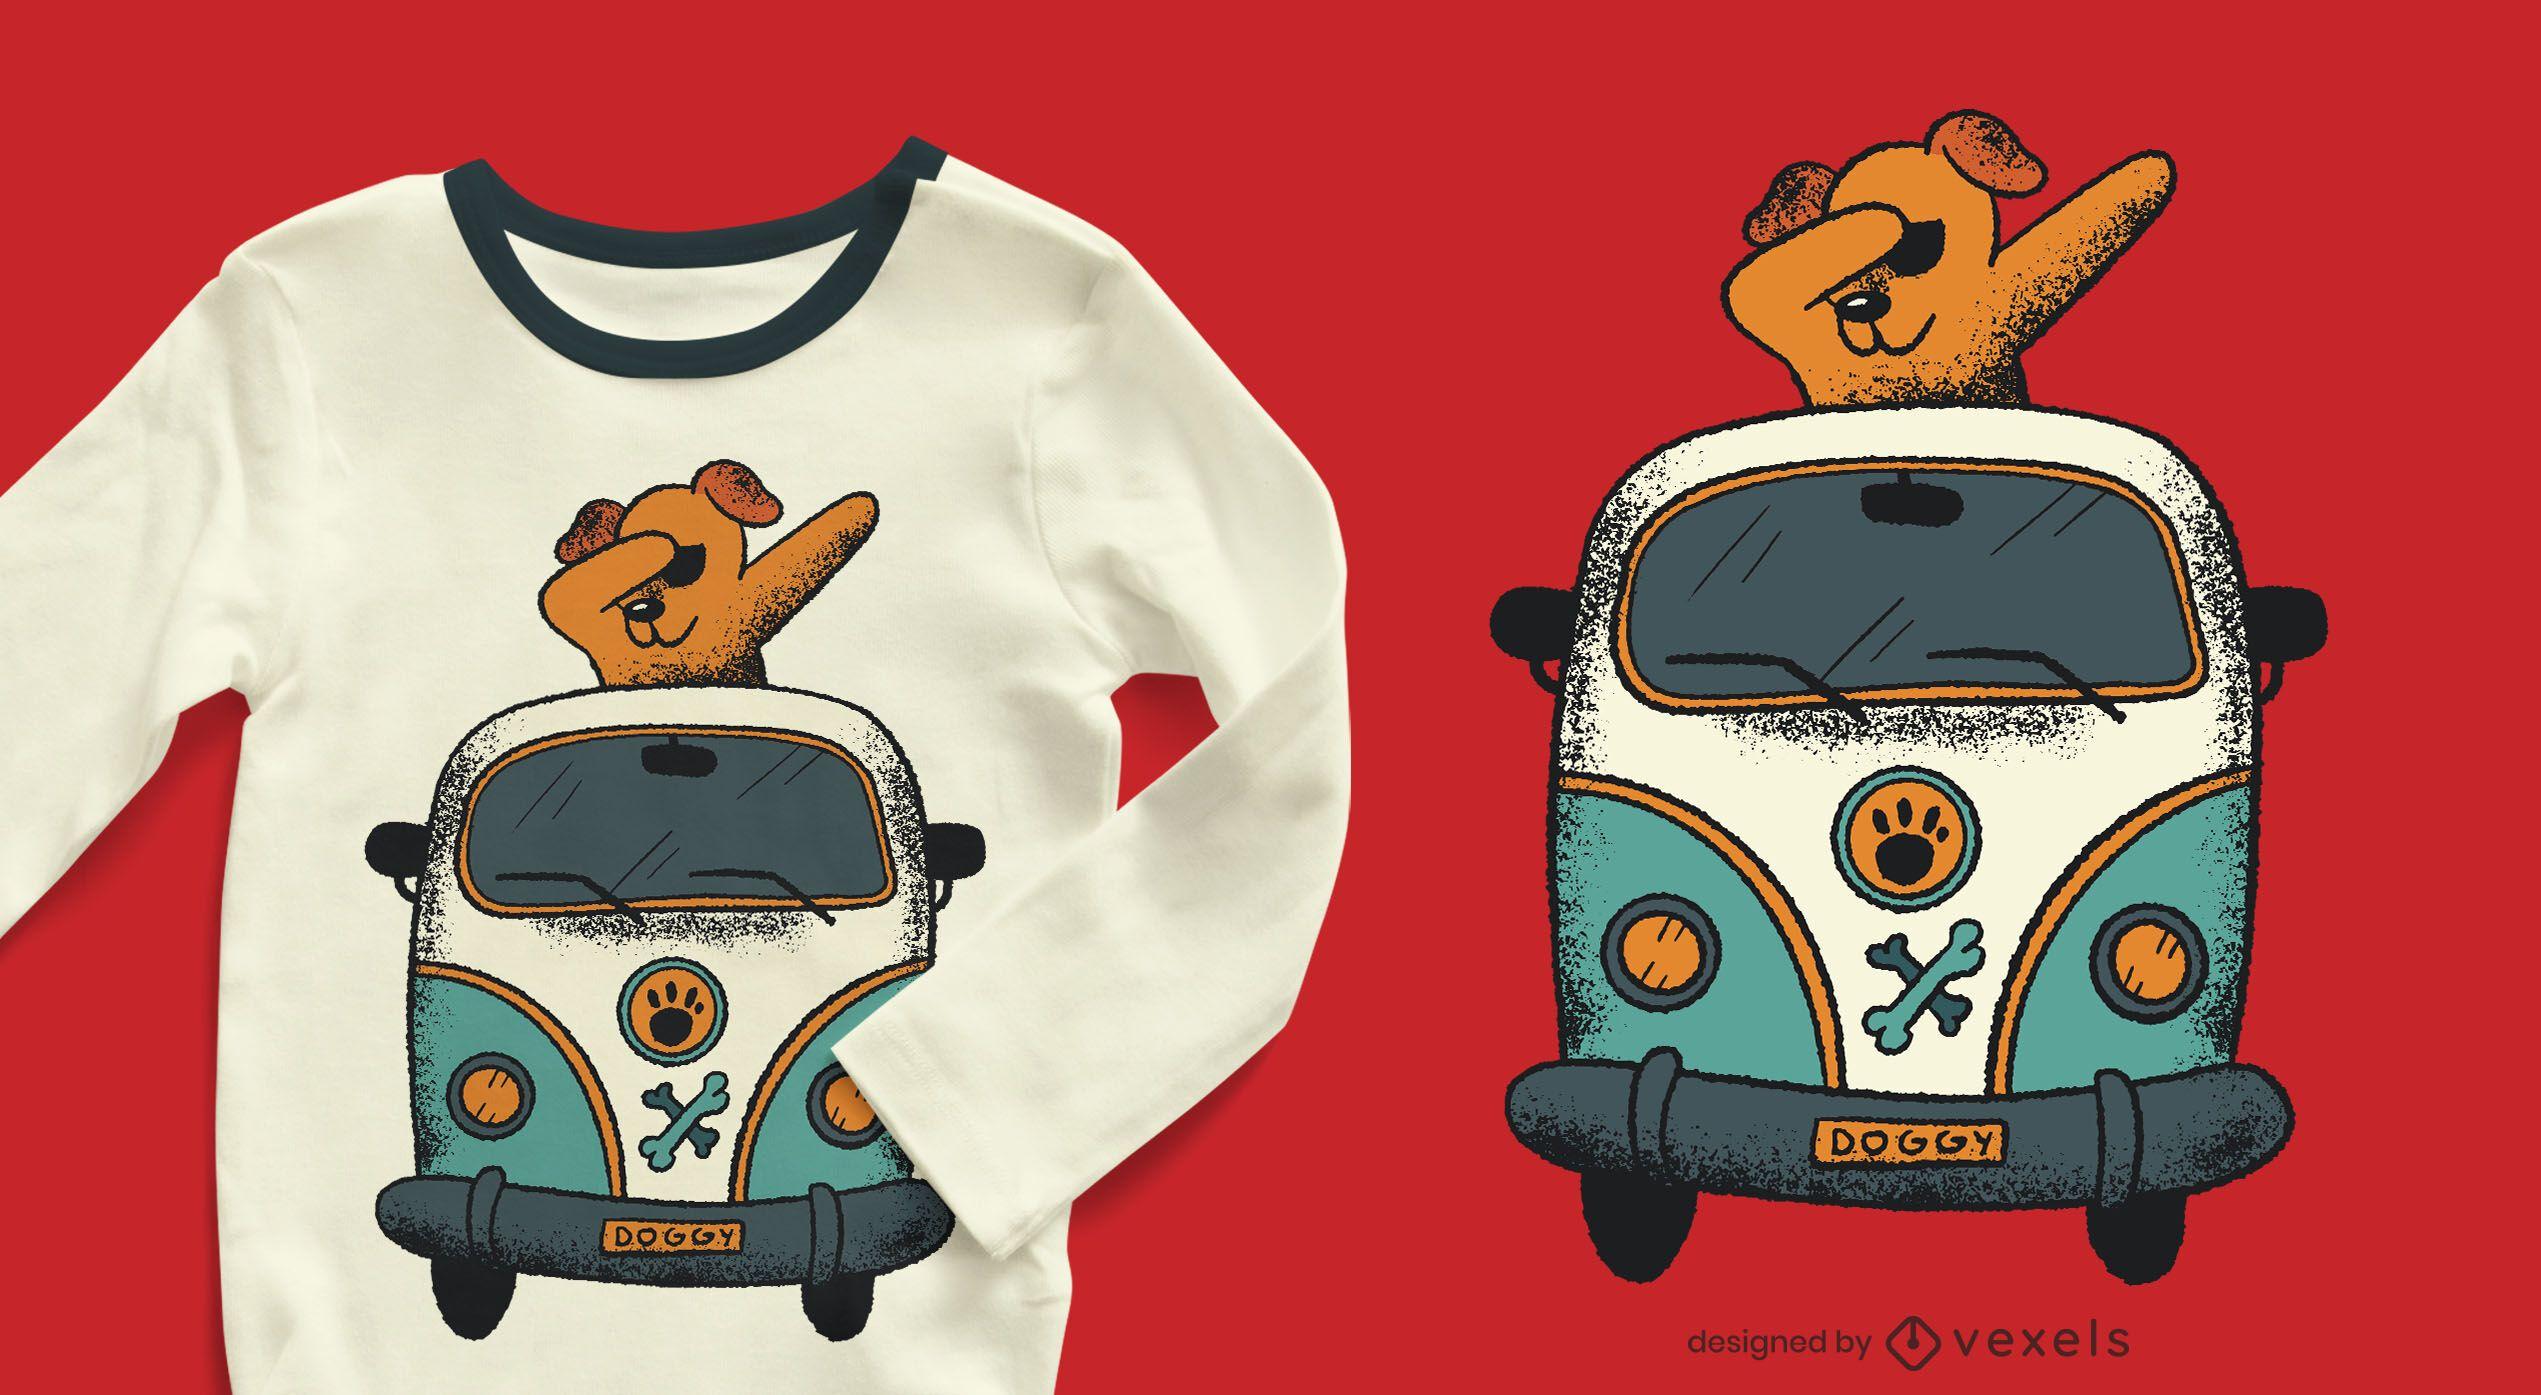 Diseño de camiseta dabbing dog van